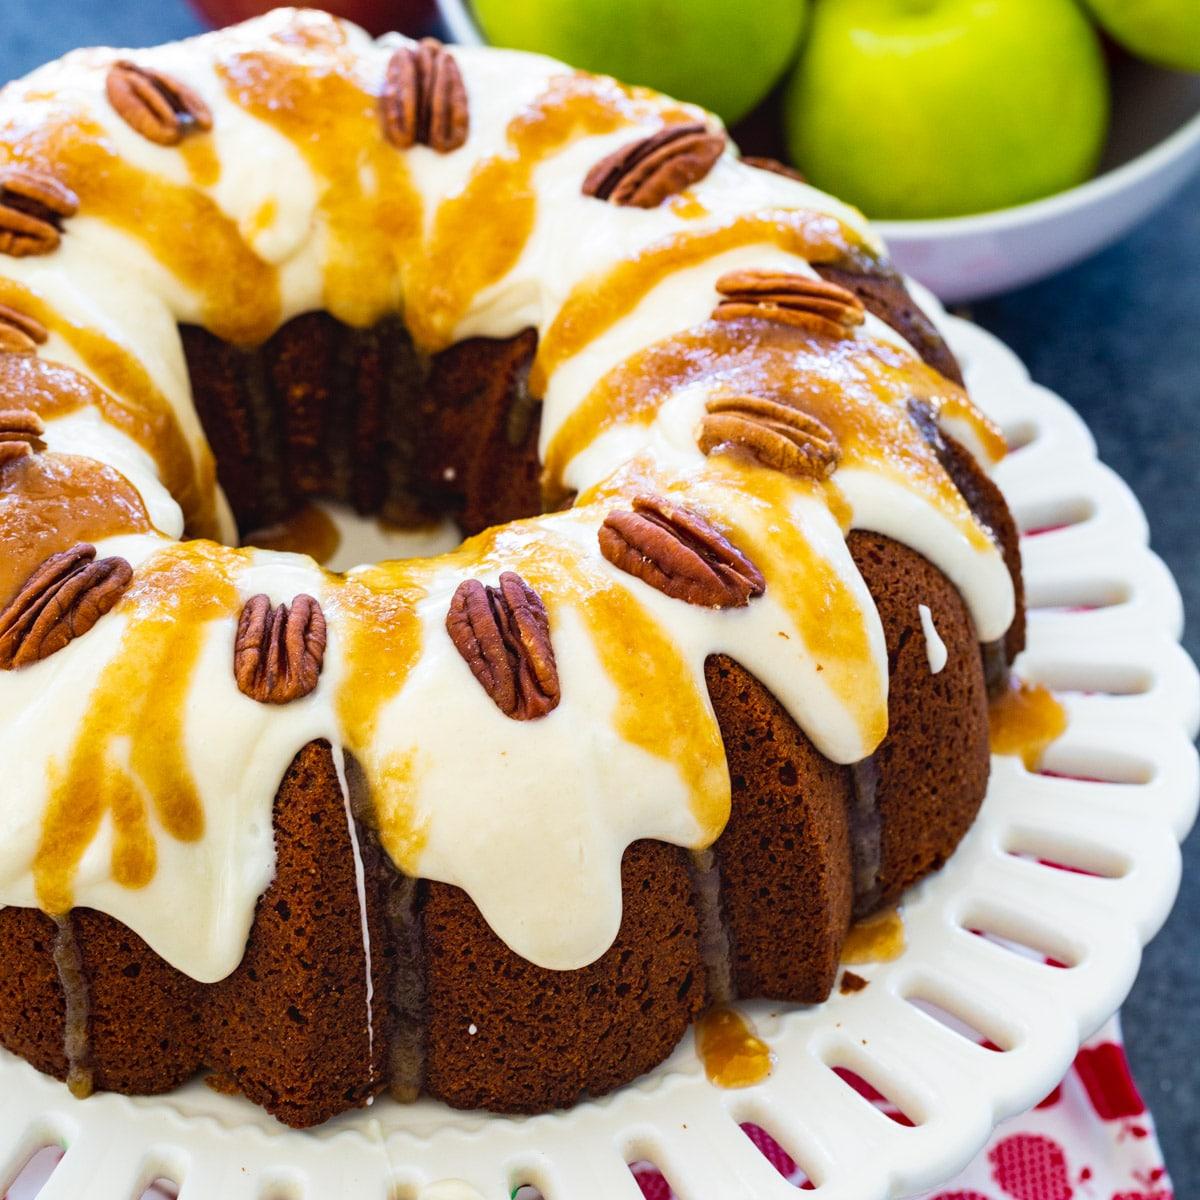 Caramel Apple Pound Cake on a cake stand.